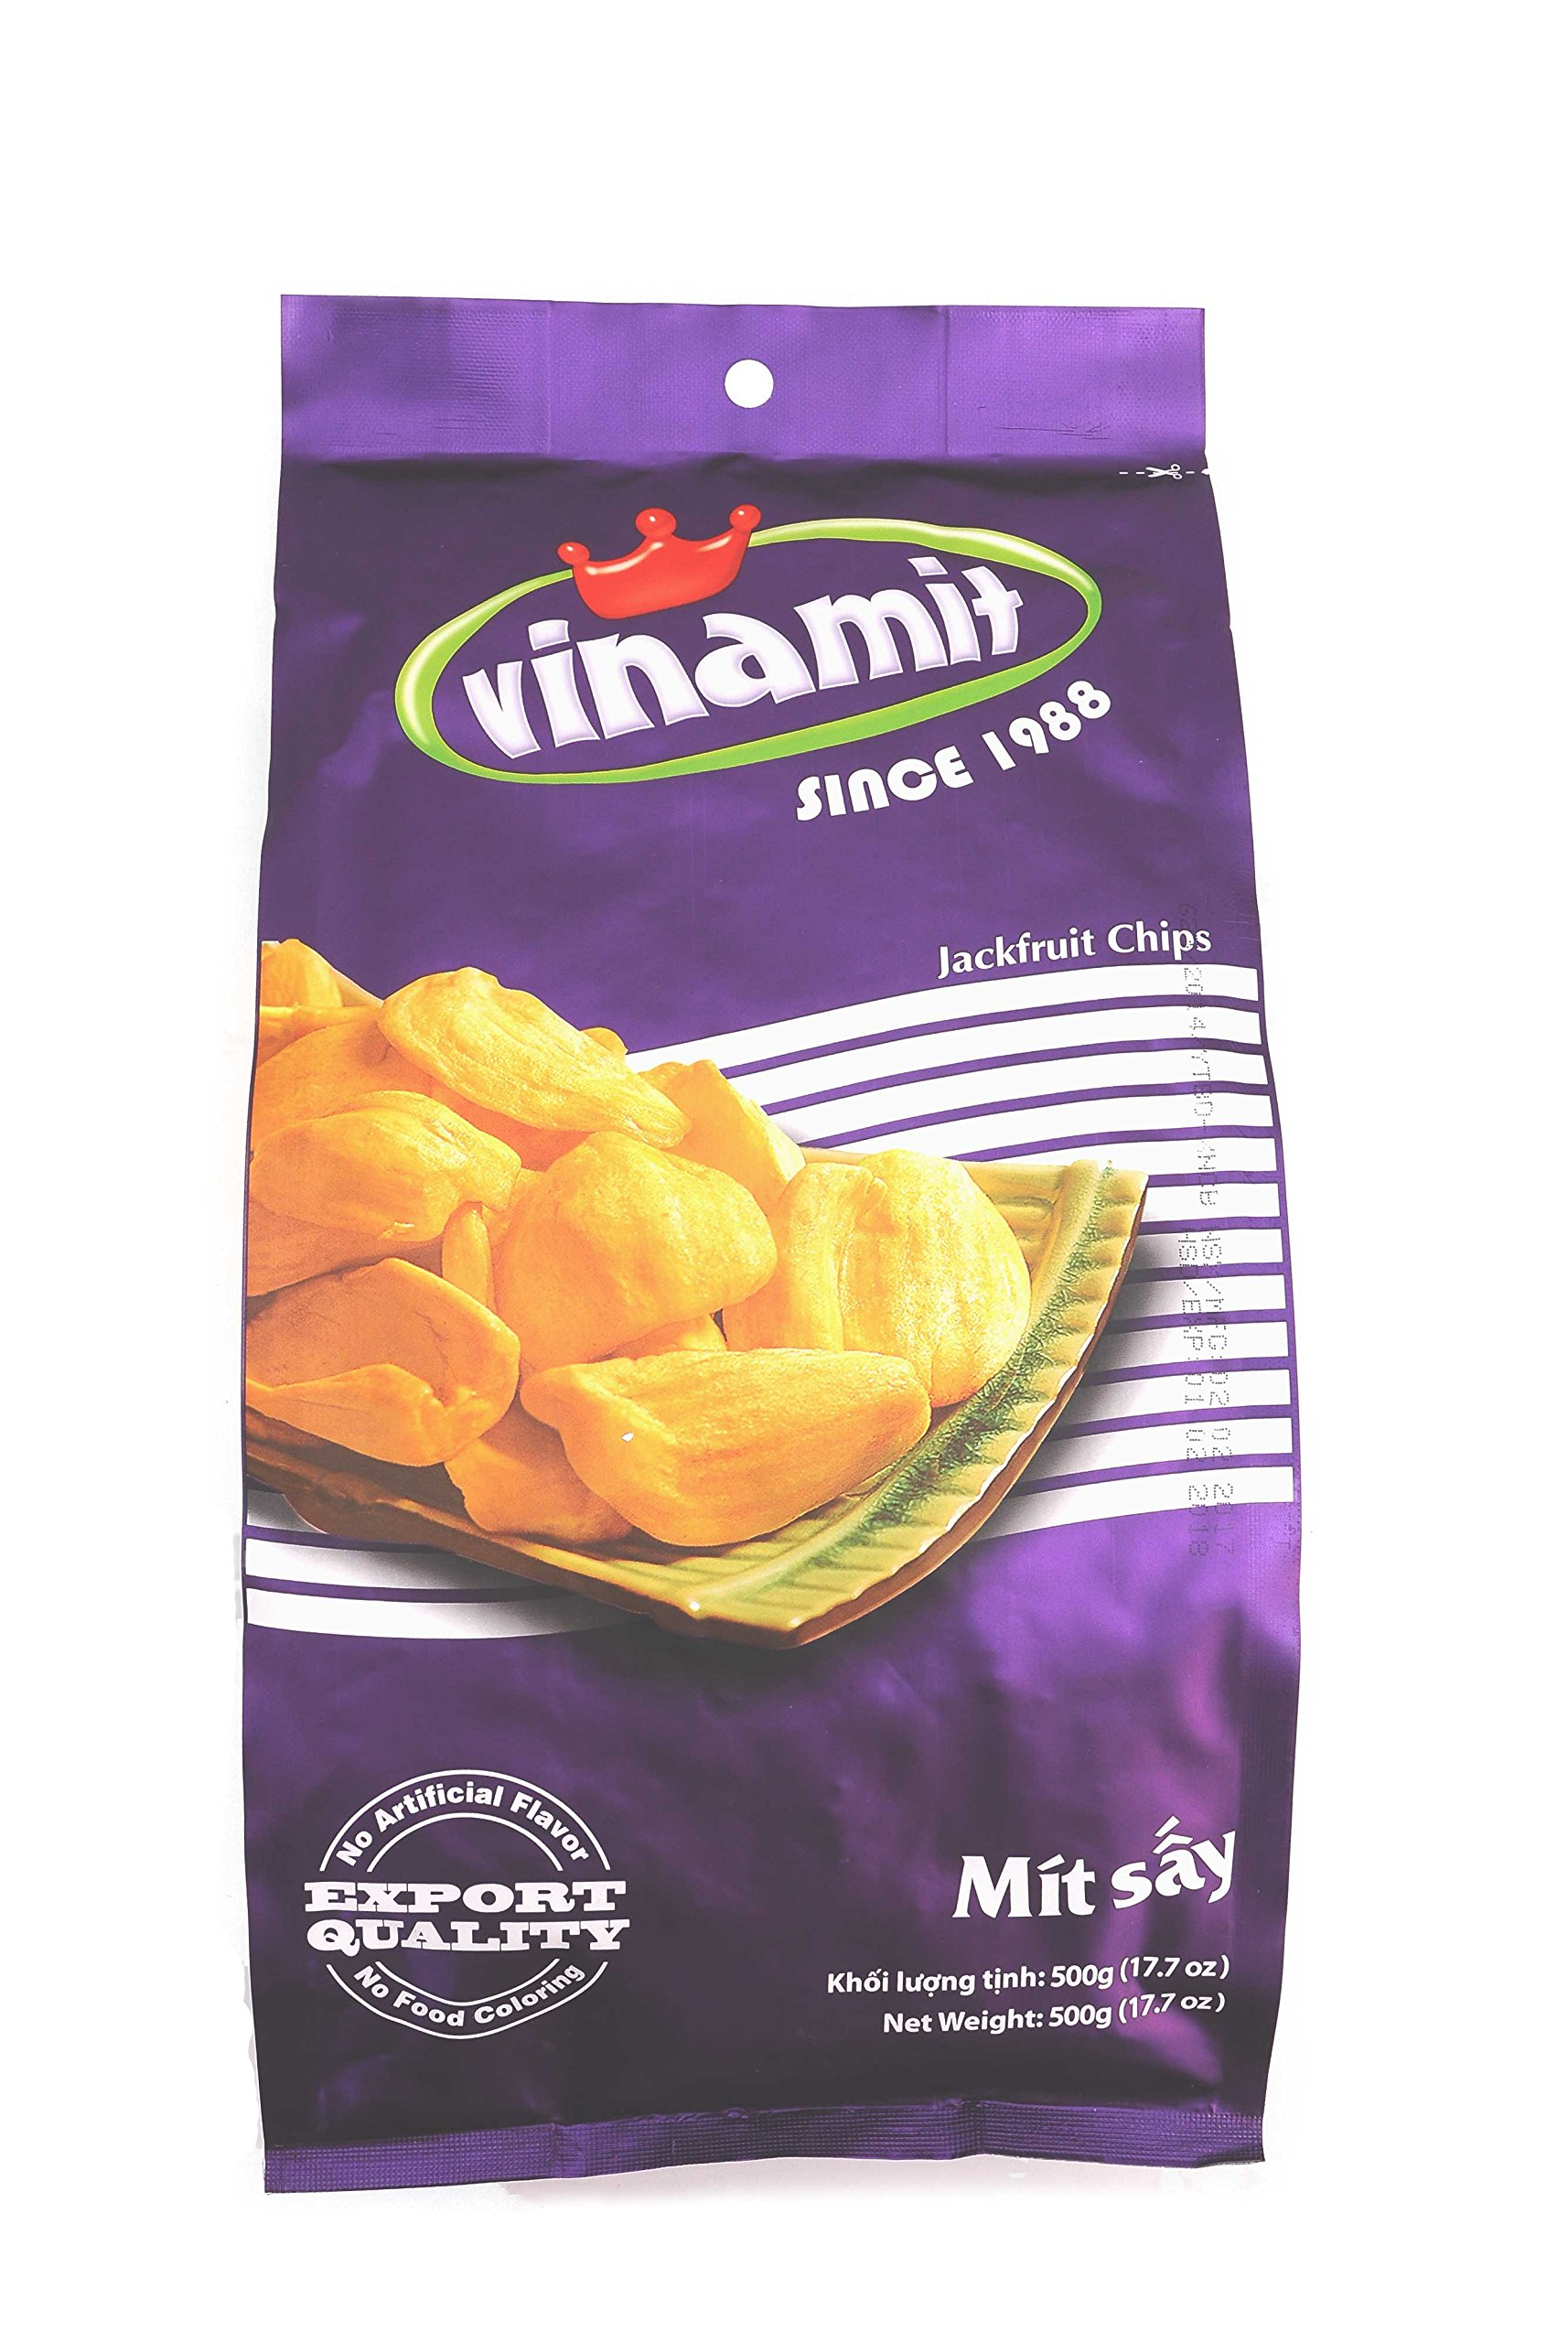 Vinamit Vietnam Jackfruit Chips - High Quality Food - 500 gram